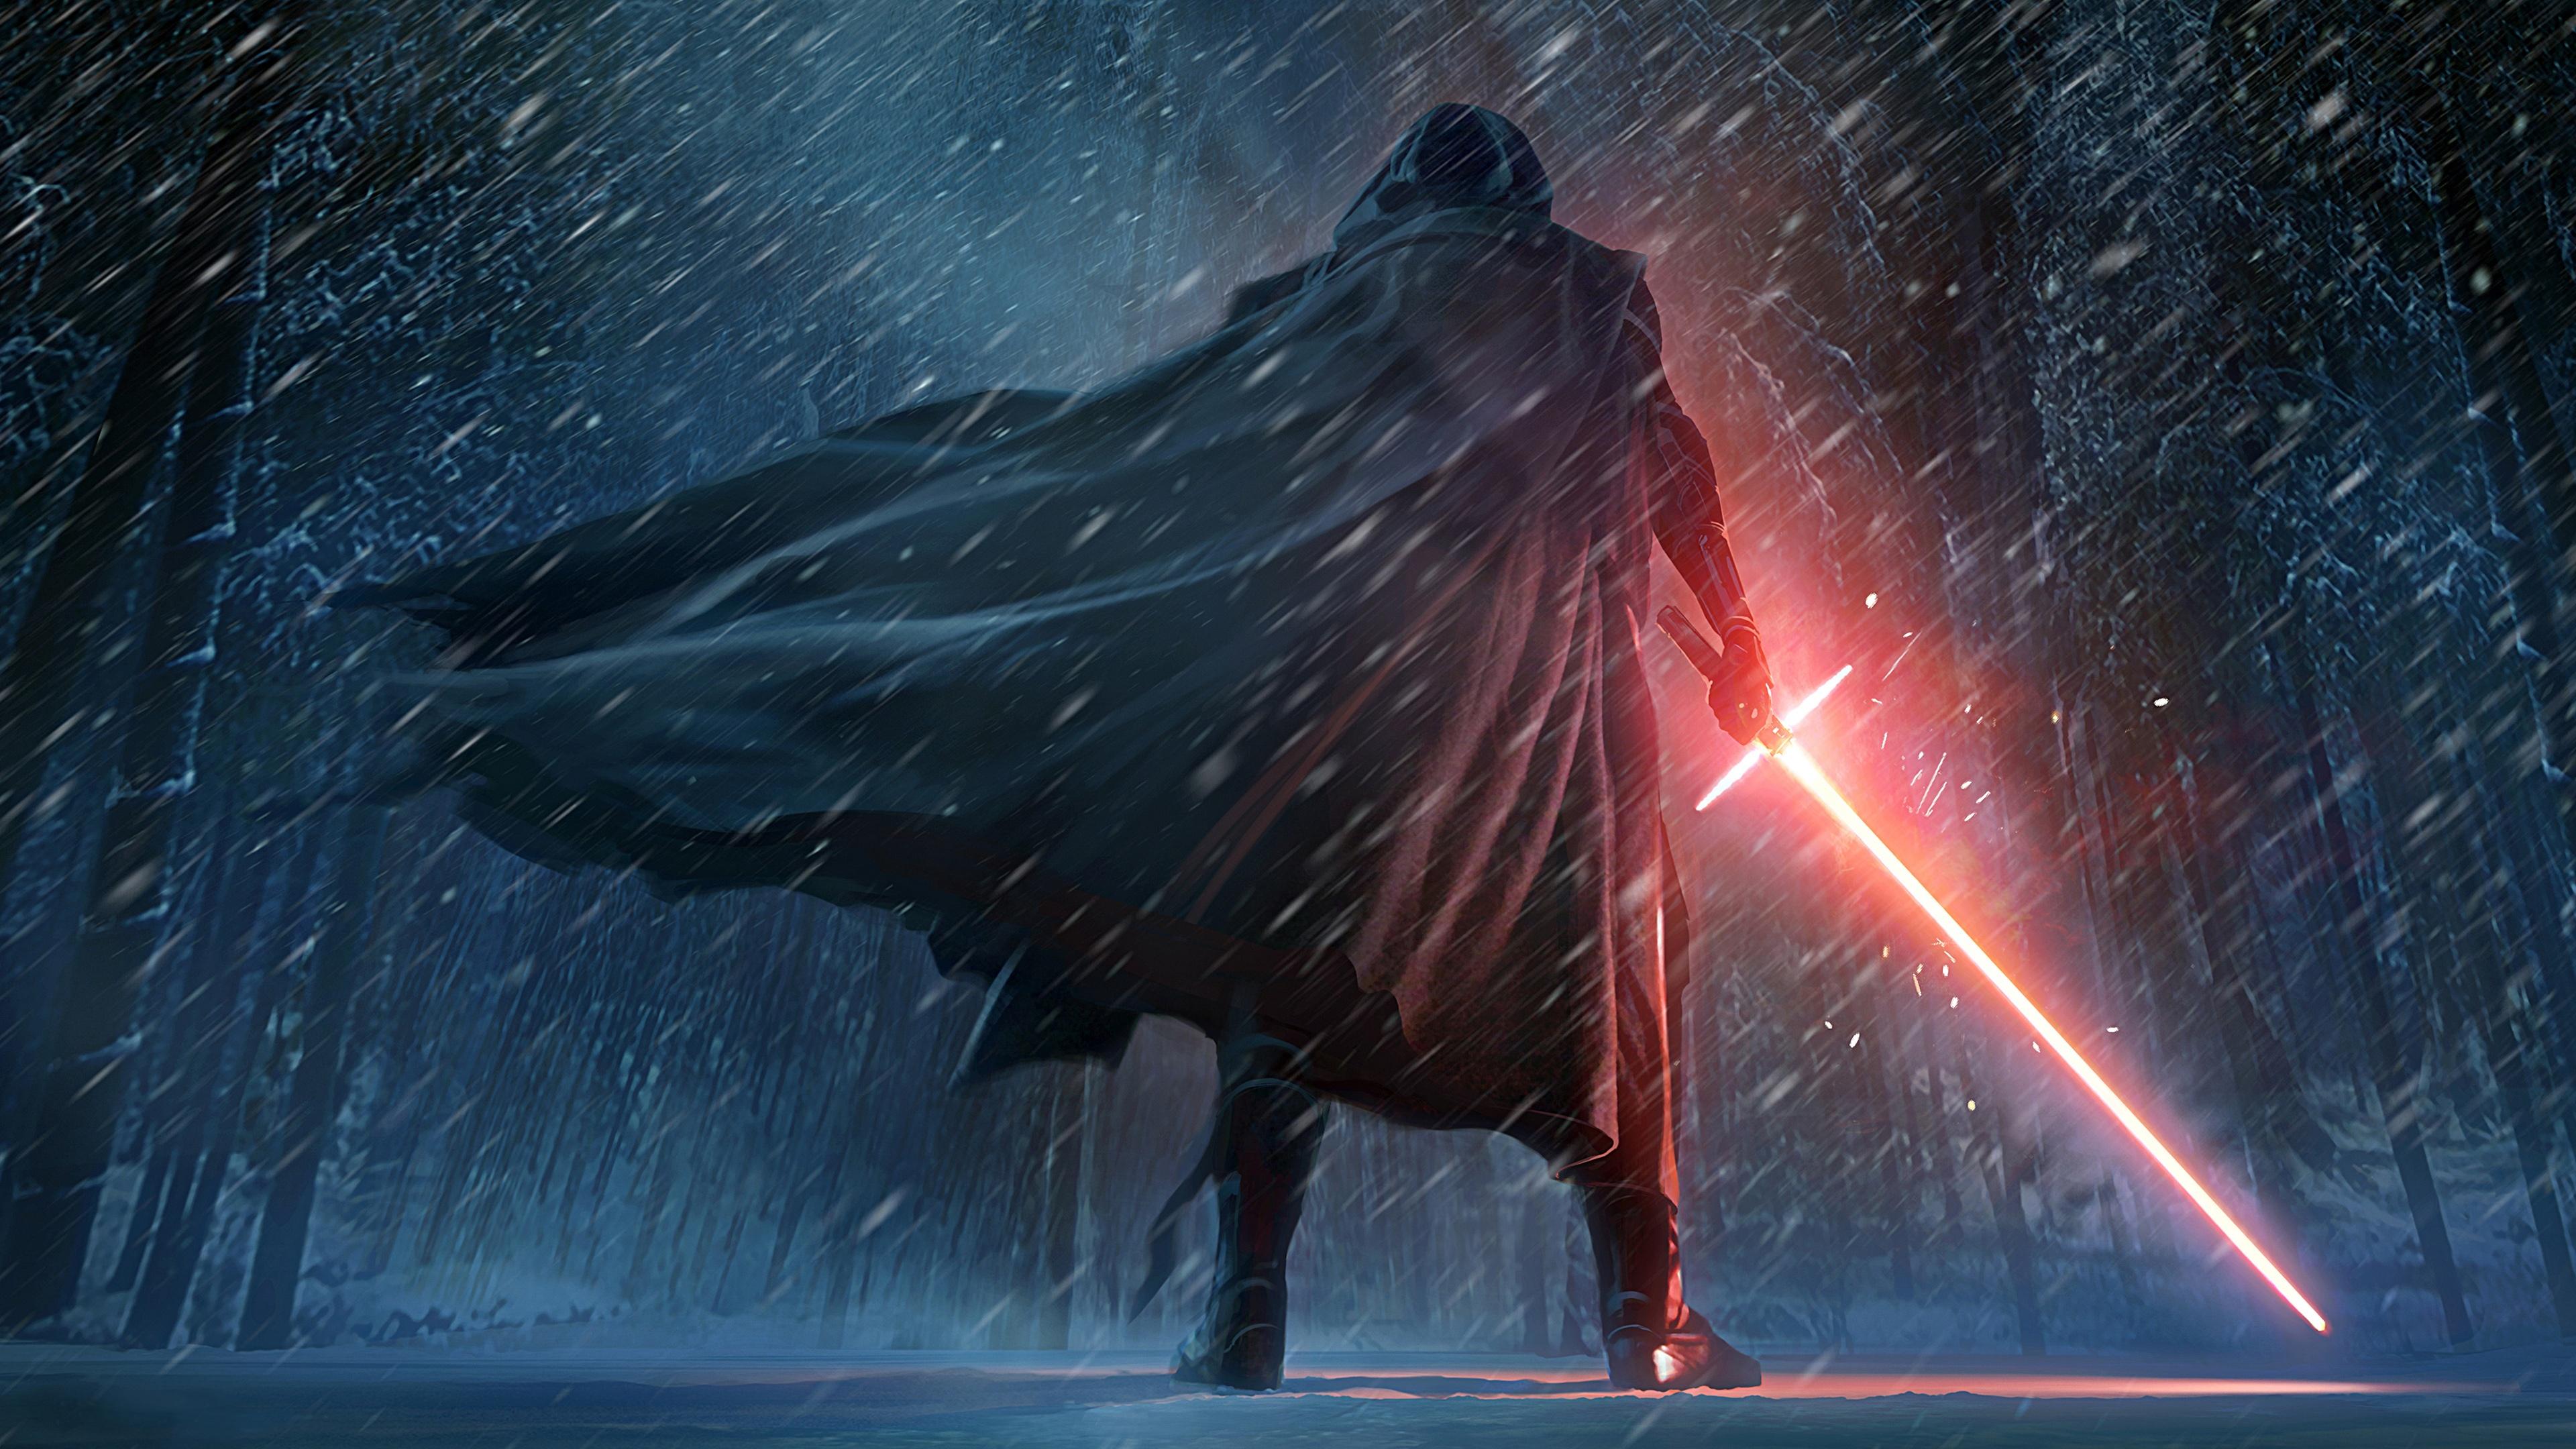 Kylo Ren Star Wars The Force Awakens Artwork Wallpapers HD 3840x2160